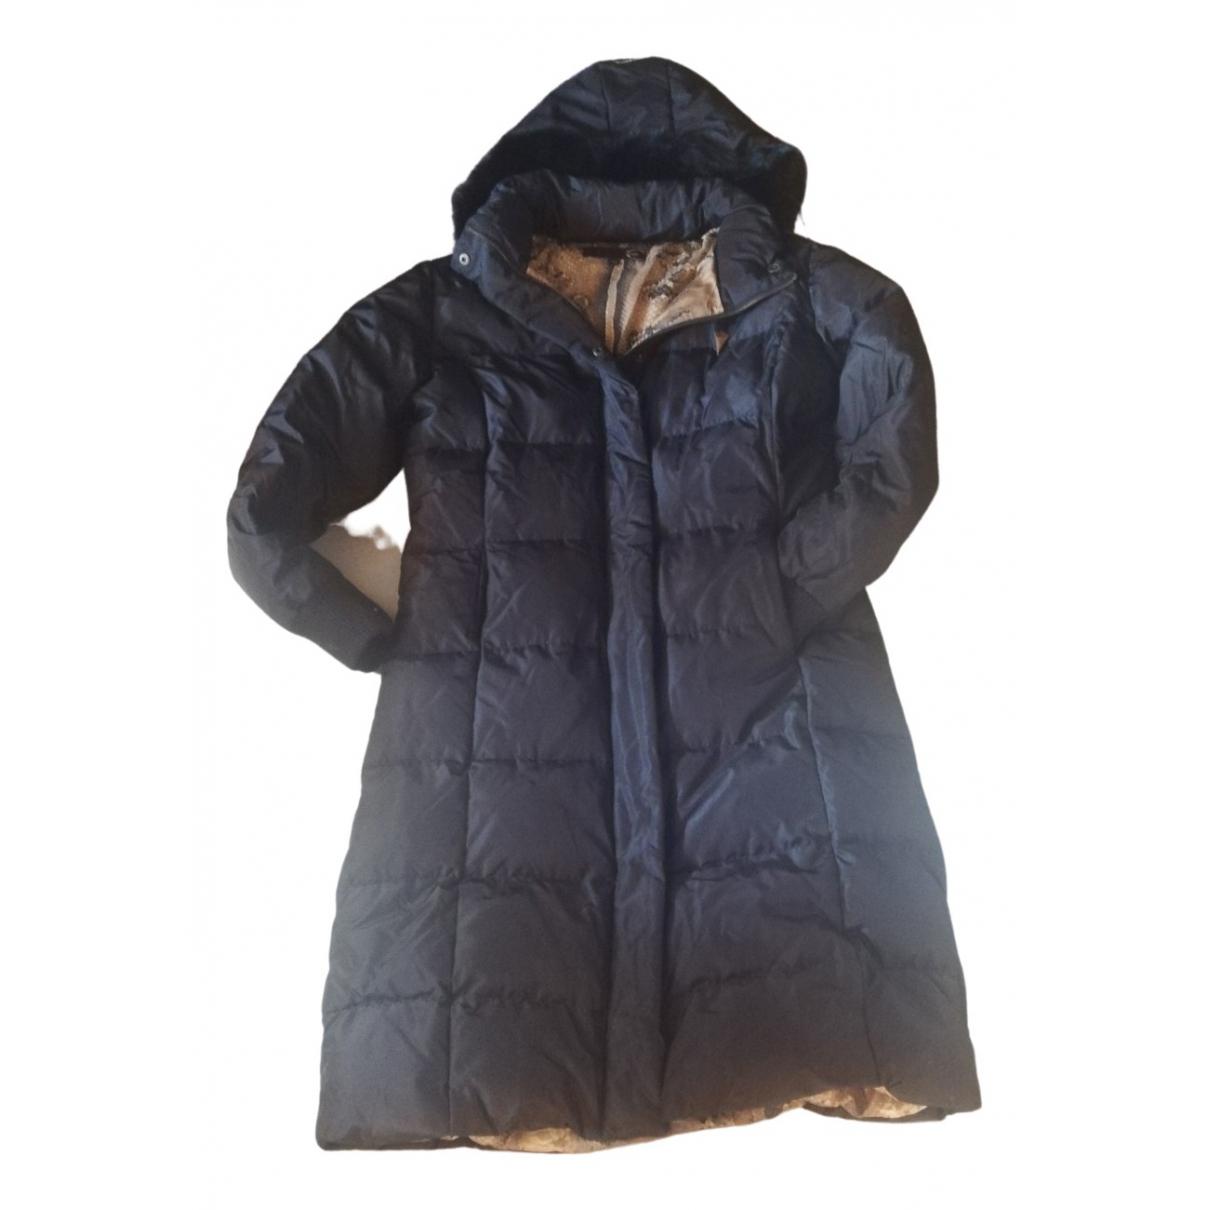 Just Cavalli \N Black Cotton jacket for Women 42 IT